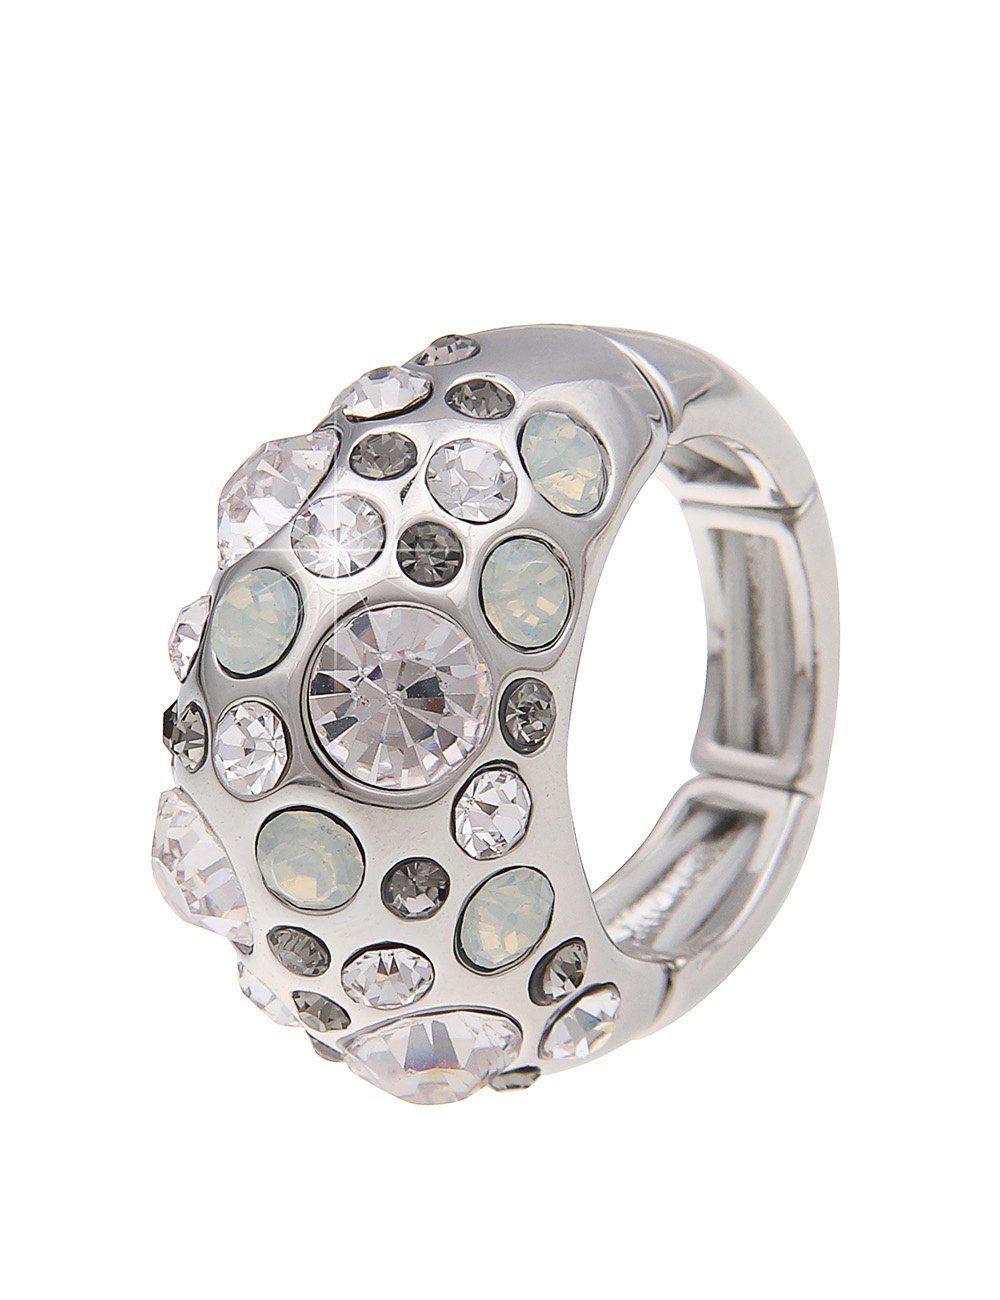 Leslii Ring mit Strass-Besatz